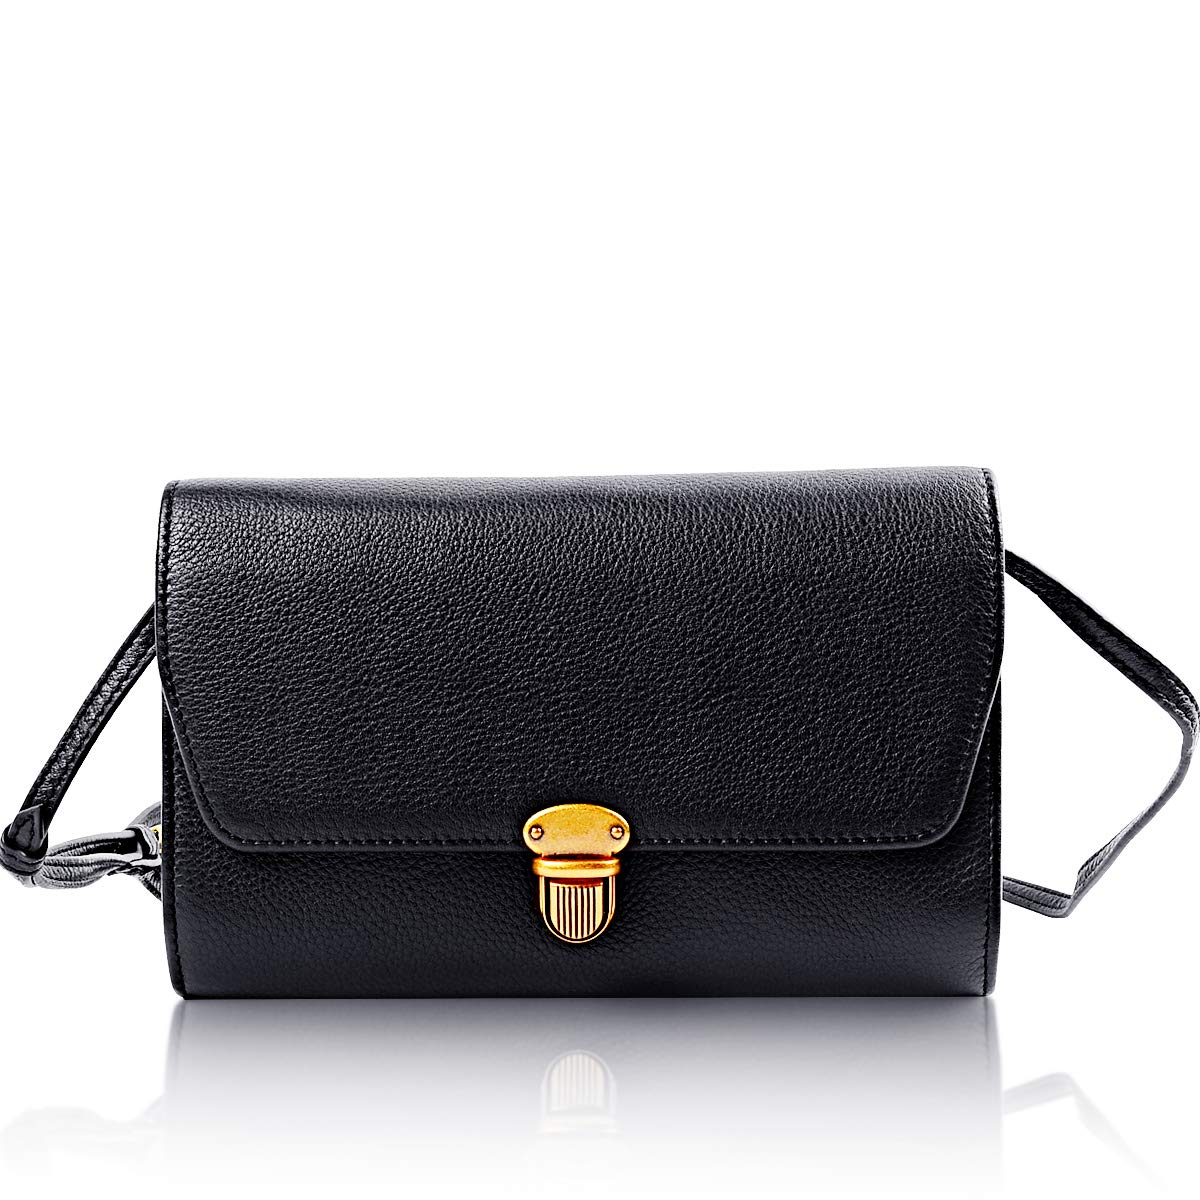 Genuine Leather Crossbody Bag, Women Leather Handbag Purse Clutch Envelope Bag, Party Ball Evening Bag